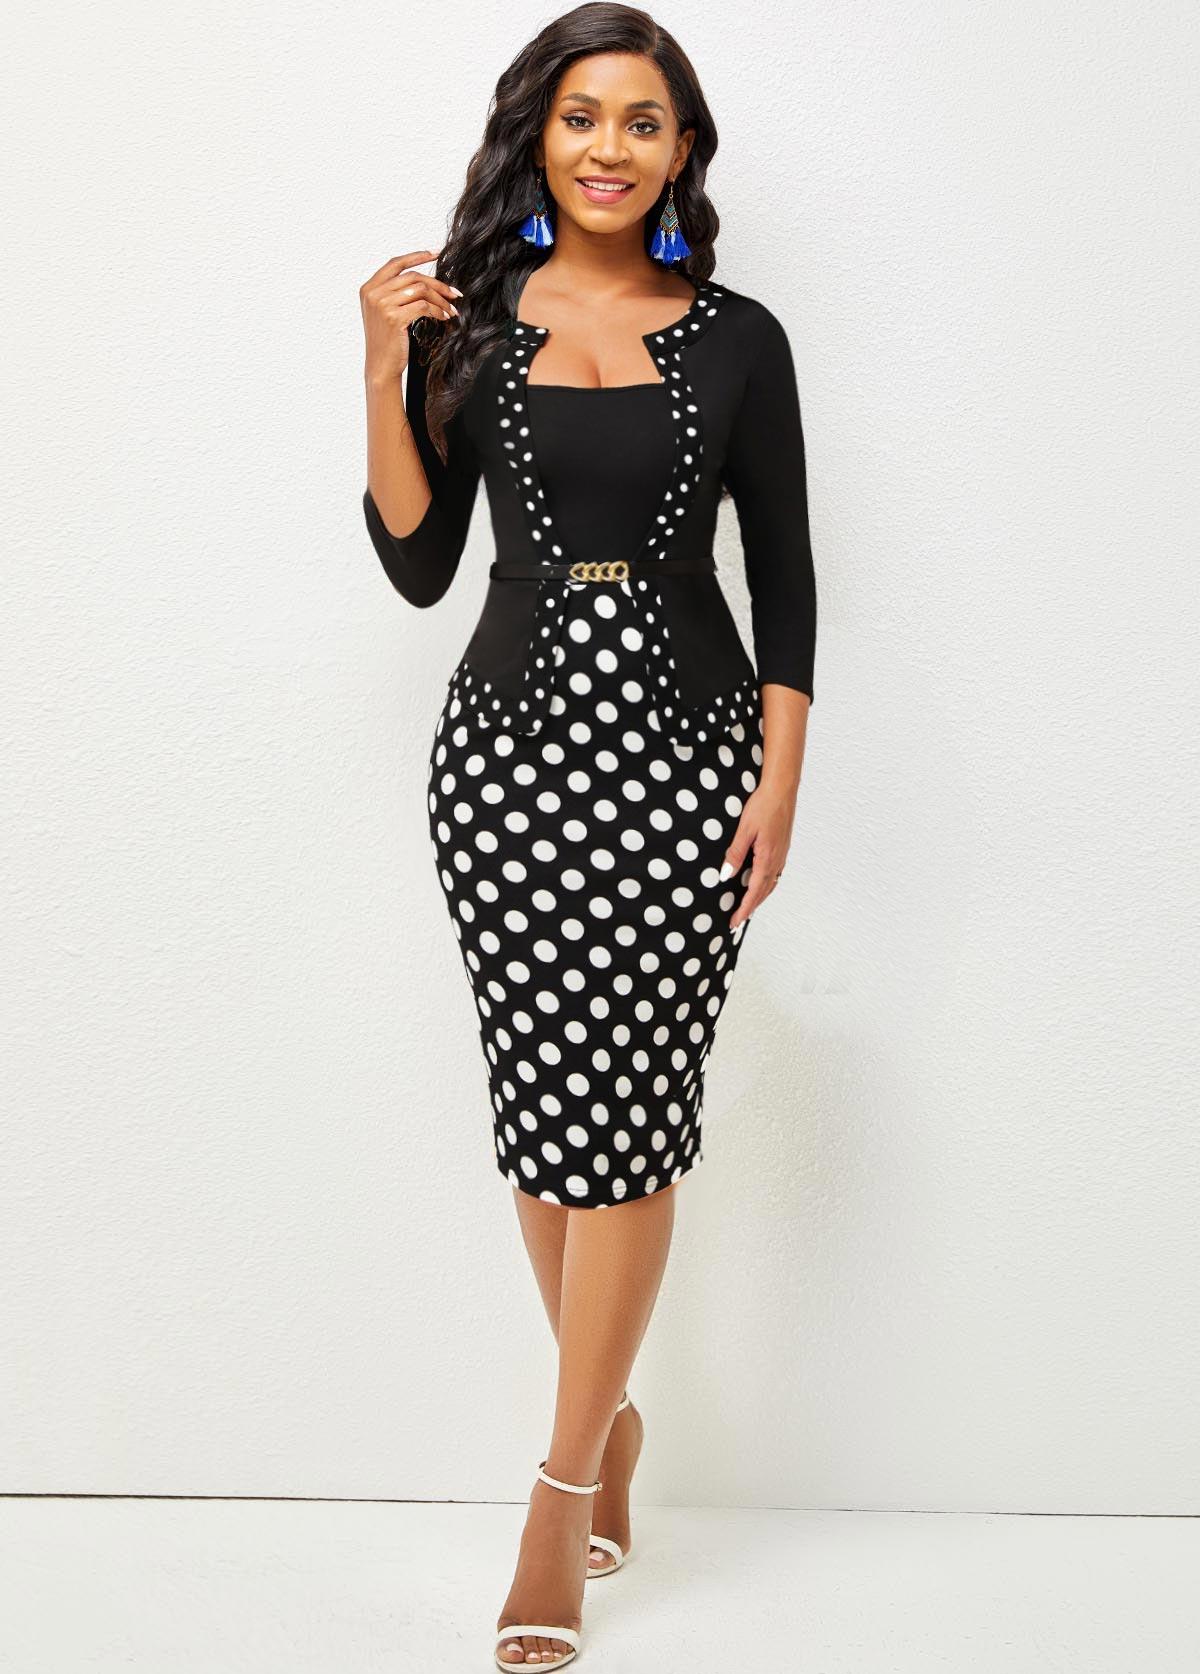 Back Slit Polka Dot 3/4 Sleeve Dress